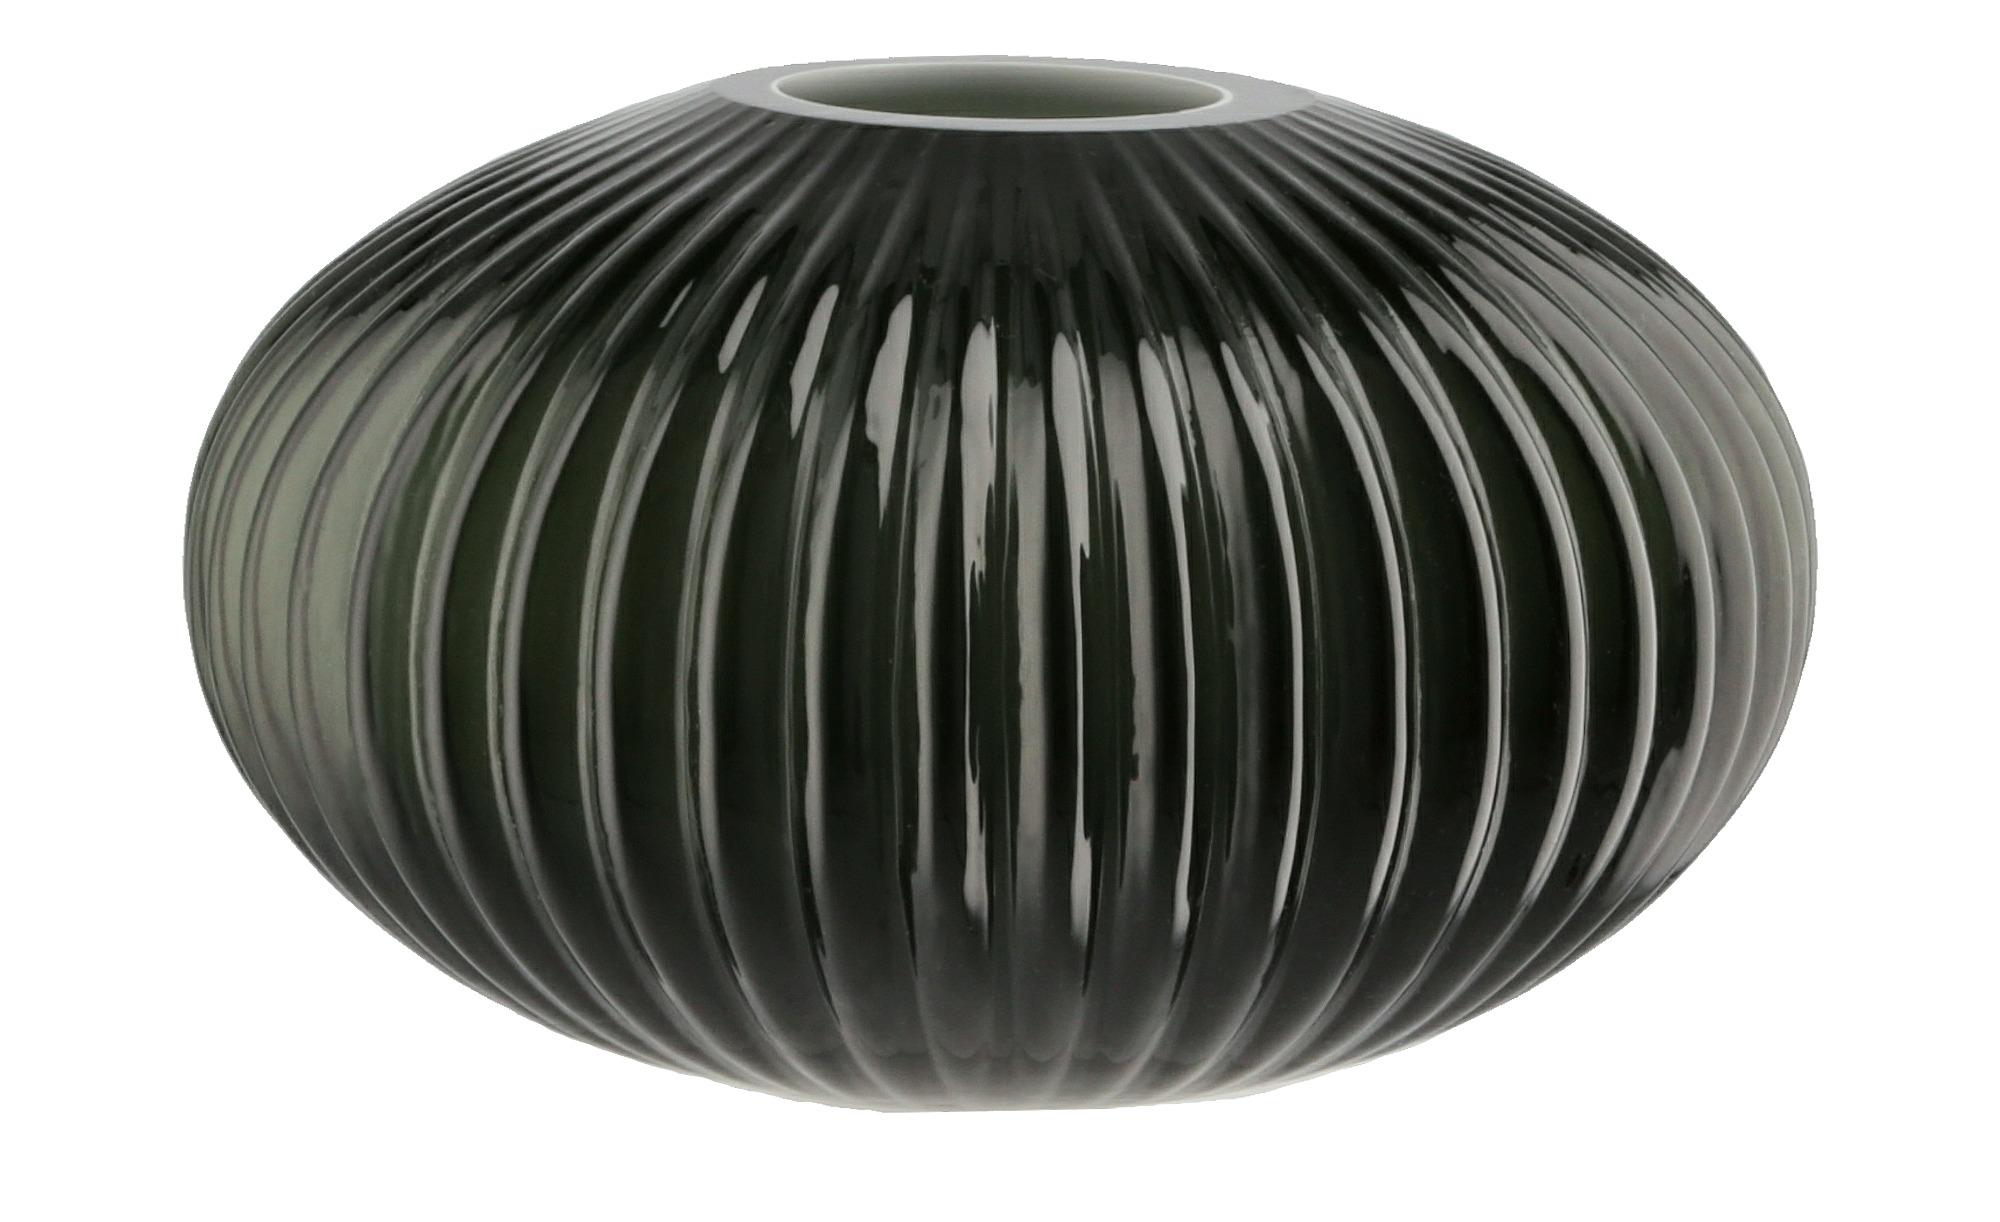 Vase - grau - Glas - 10 cm - Dekoration > Vasen - Möbel Kraft | Dekoration > Vasen > Tischvasen | Möbel Kraft